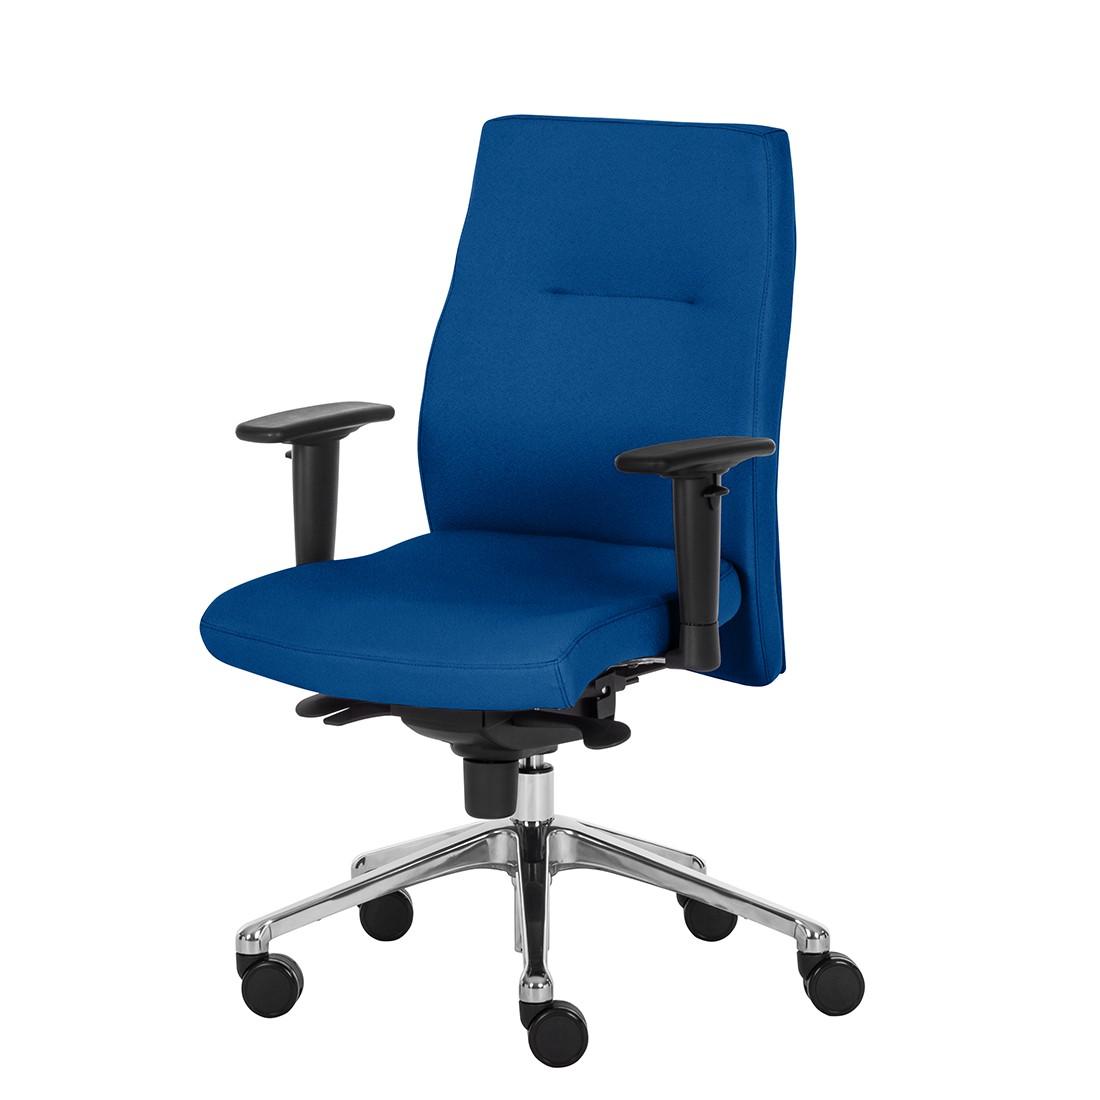 Bürodrehstuhl Nero UP R – Blau, Nowy Styl günstig bestellen